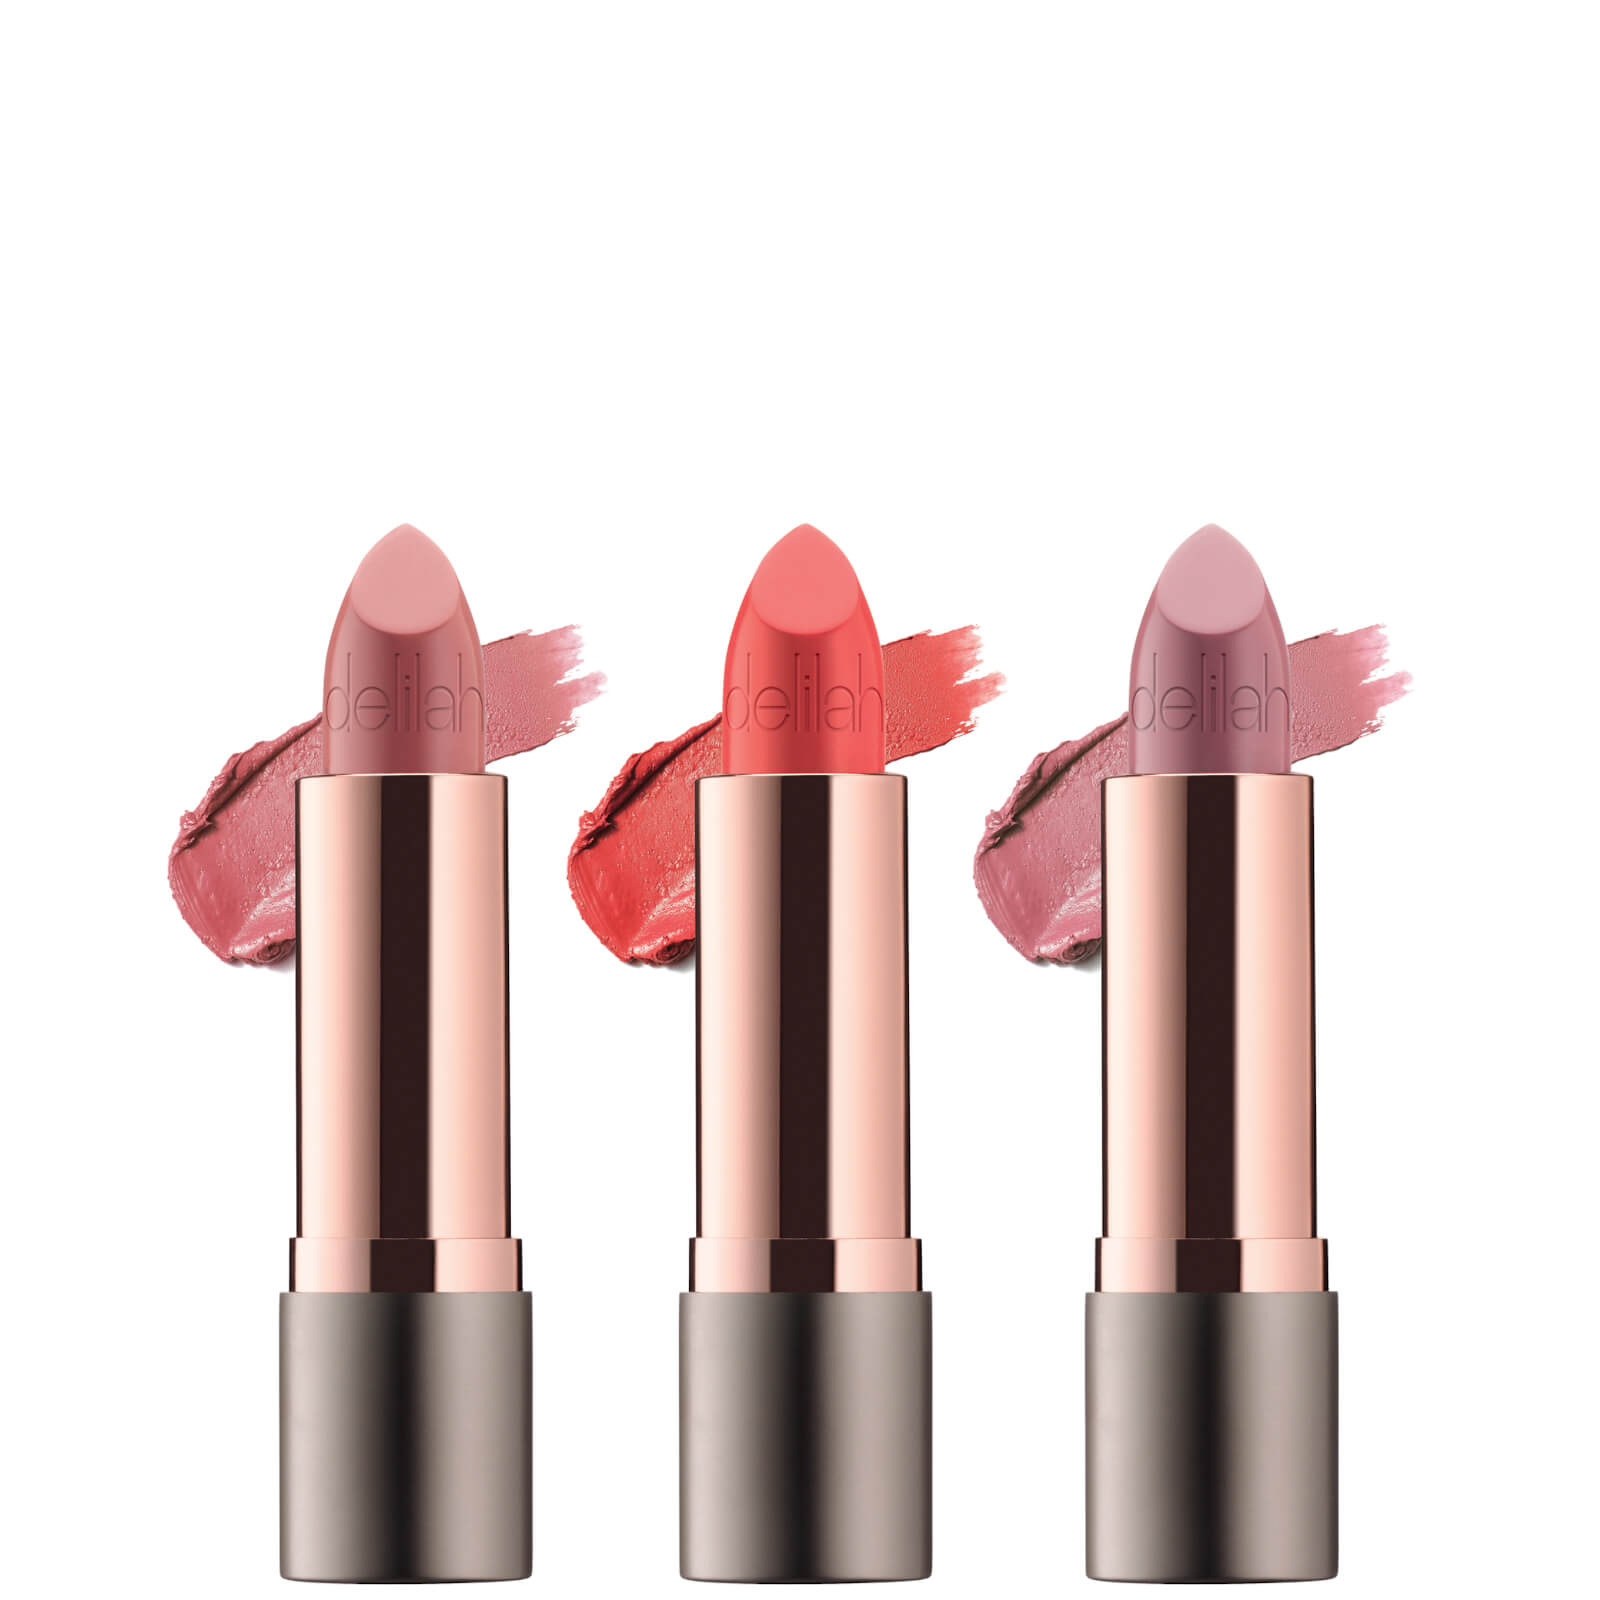 Delilah Colour Intense Lipstick Trio  - Купить